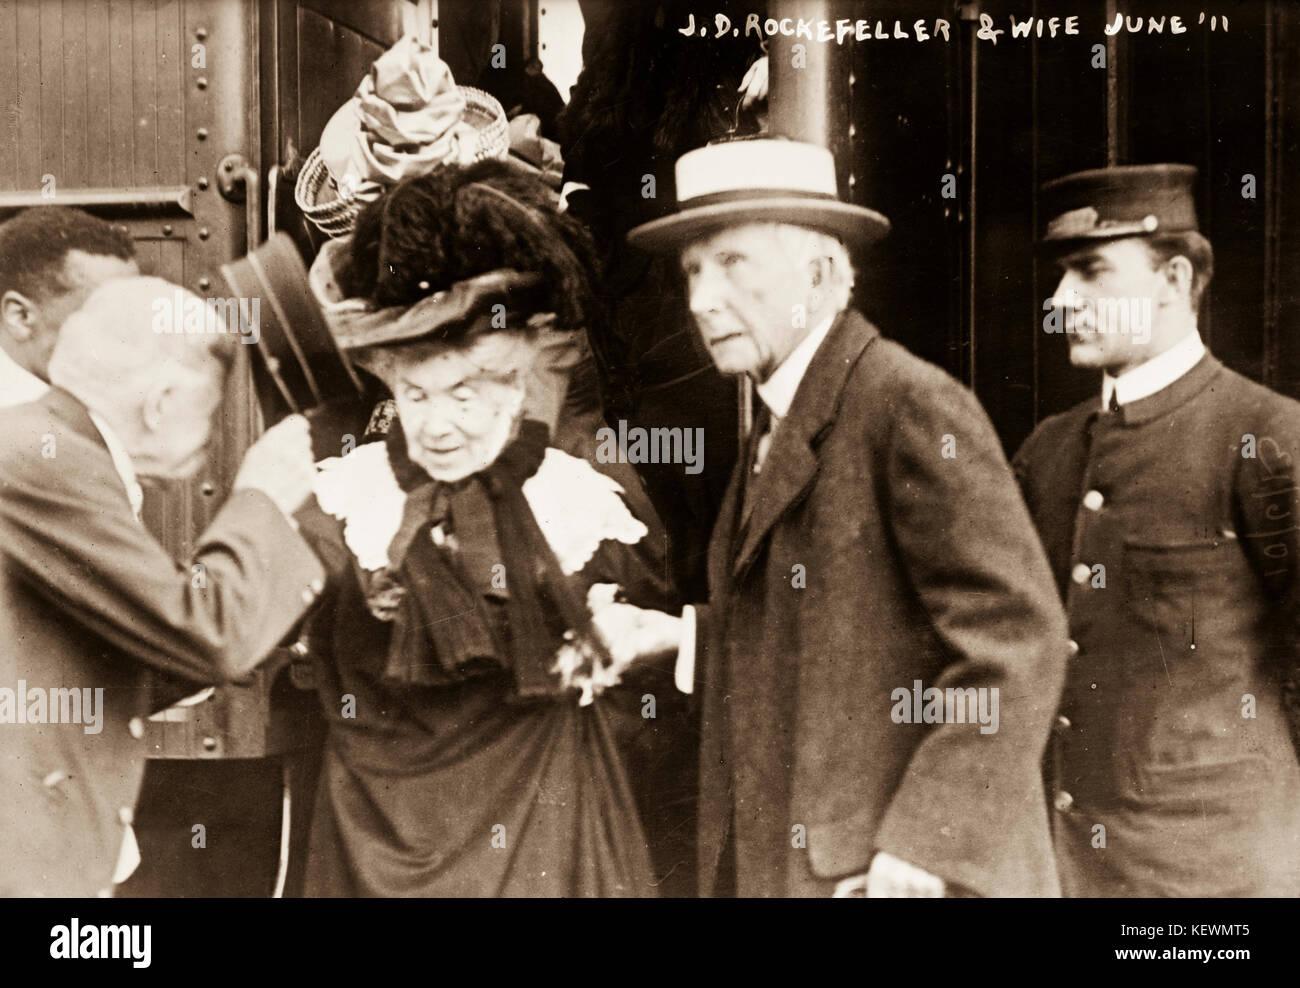 John Davison Rockefeller, 1839-1937, with wife disembarking train - Stock Image